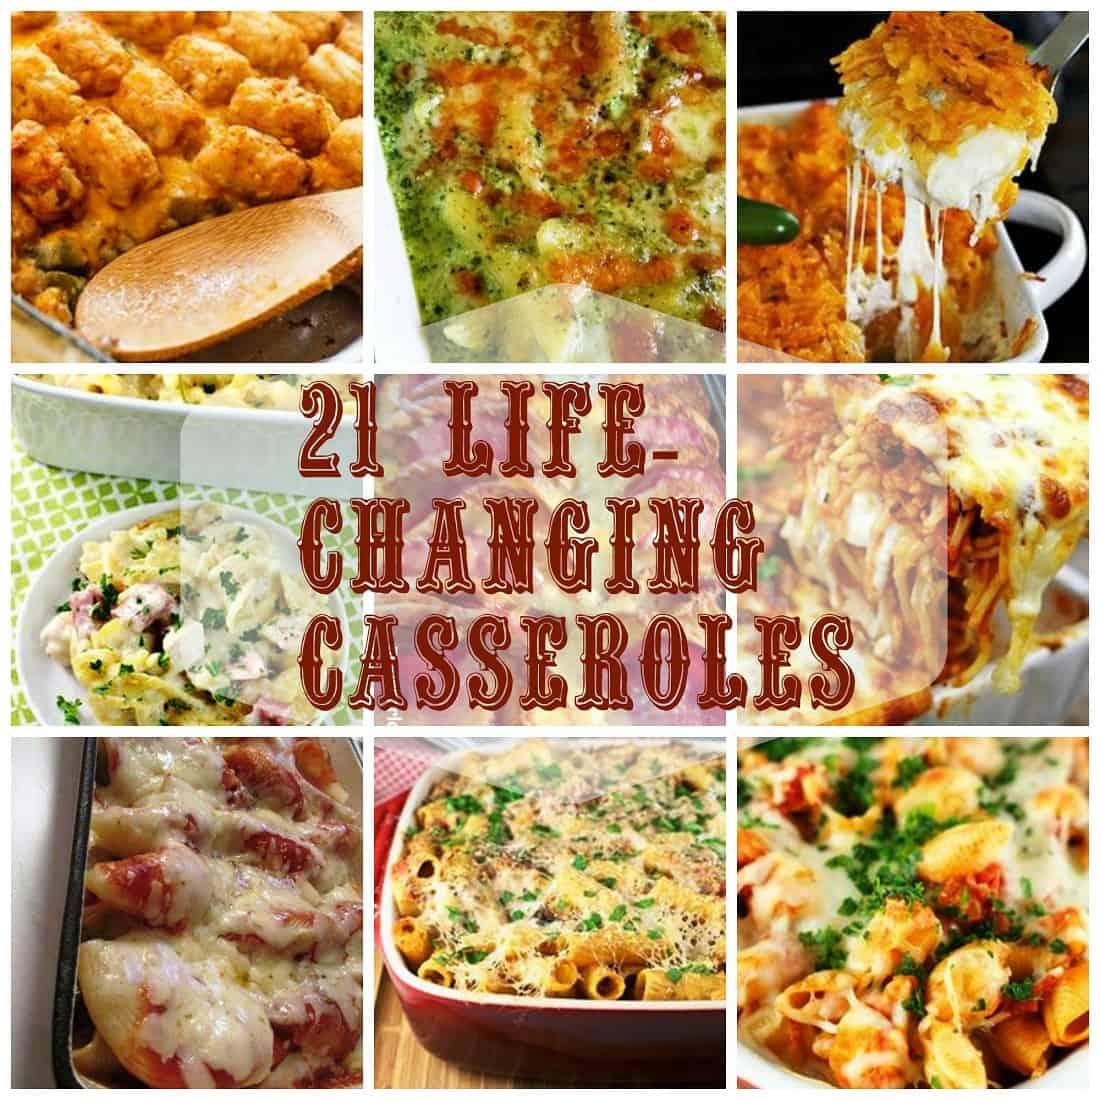 24 Life-Changing Casseroles via @Mooreorlesscook